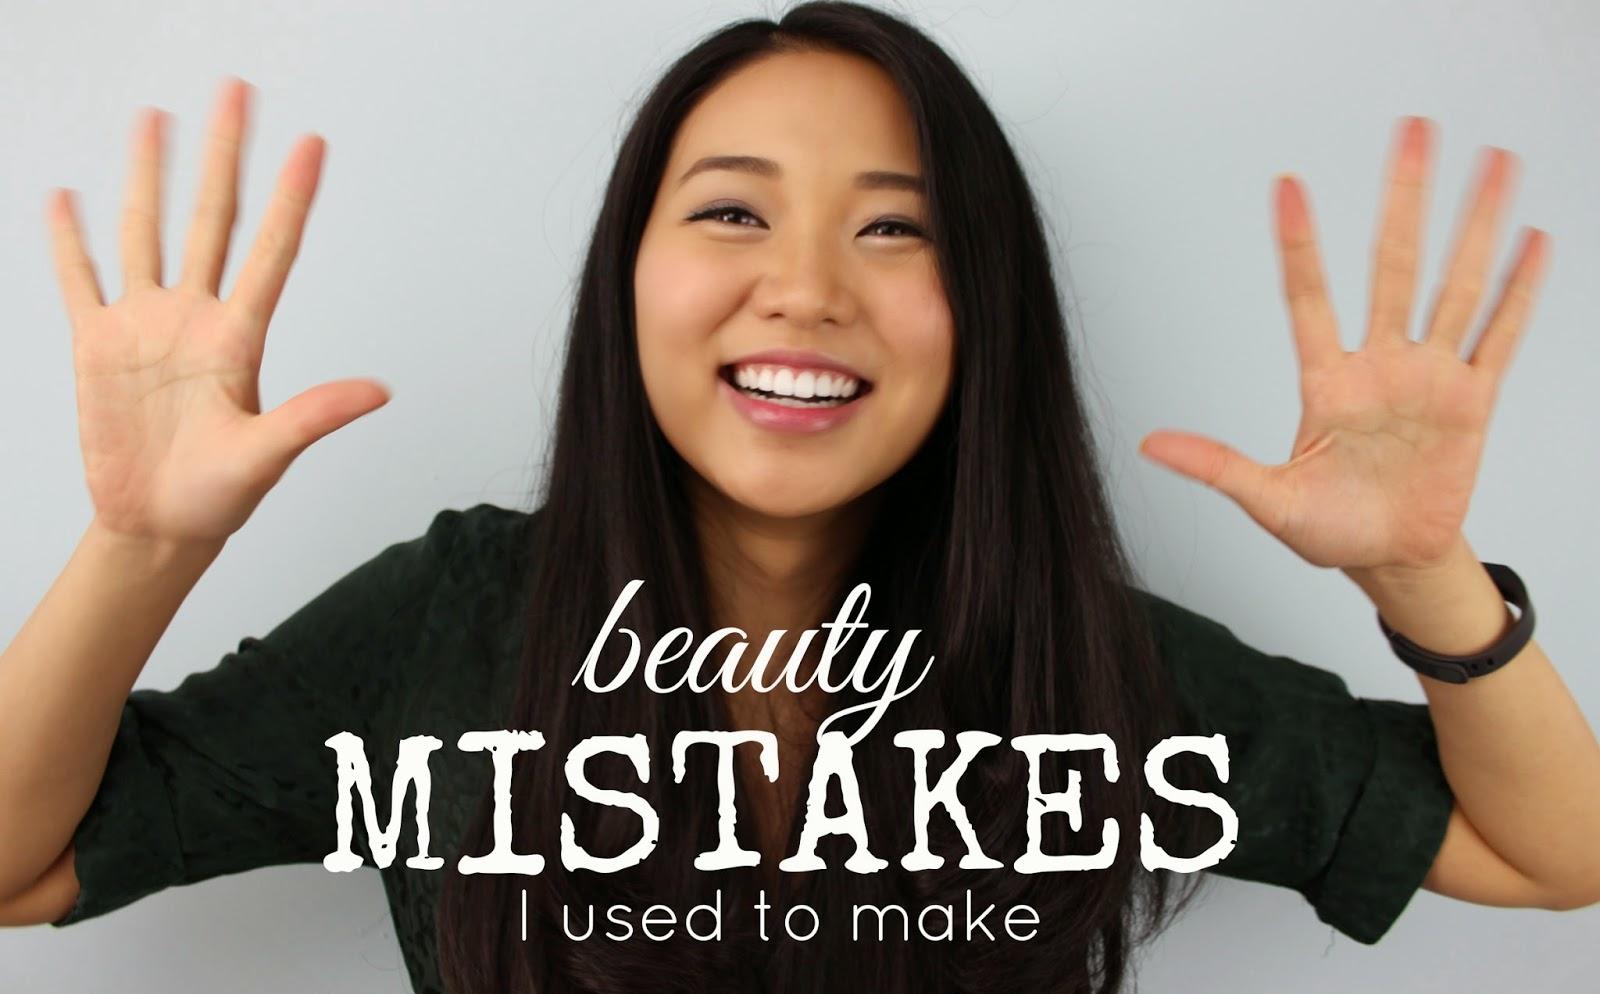 10 Beauty Mistakes I Used to Make